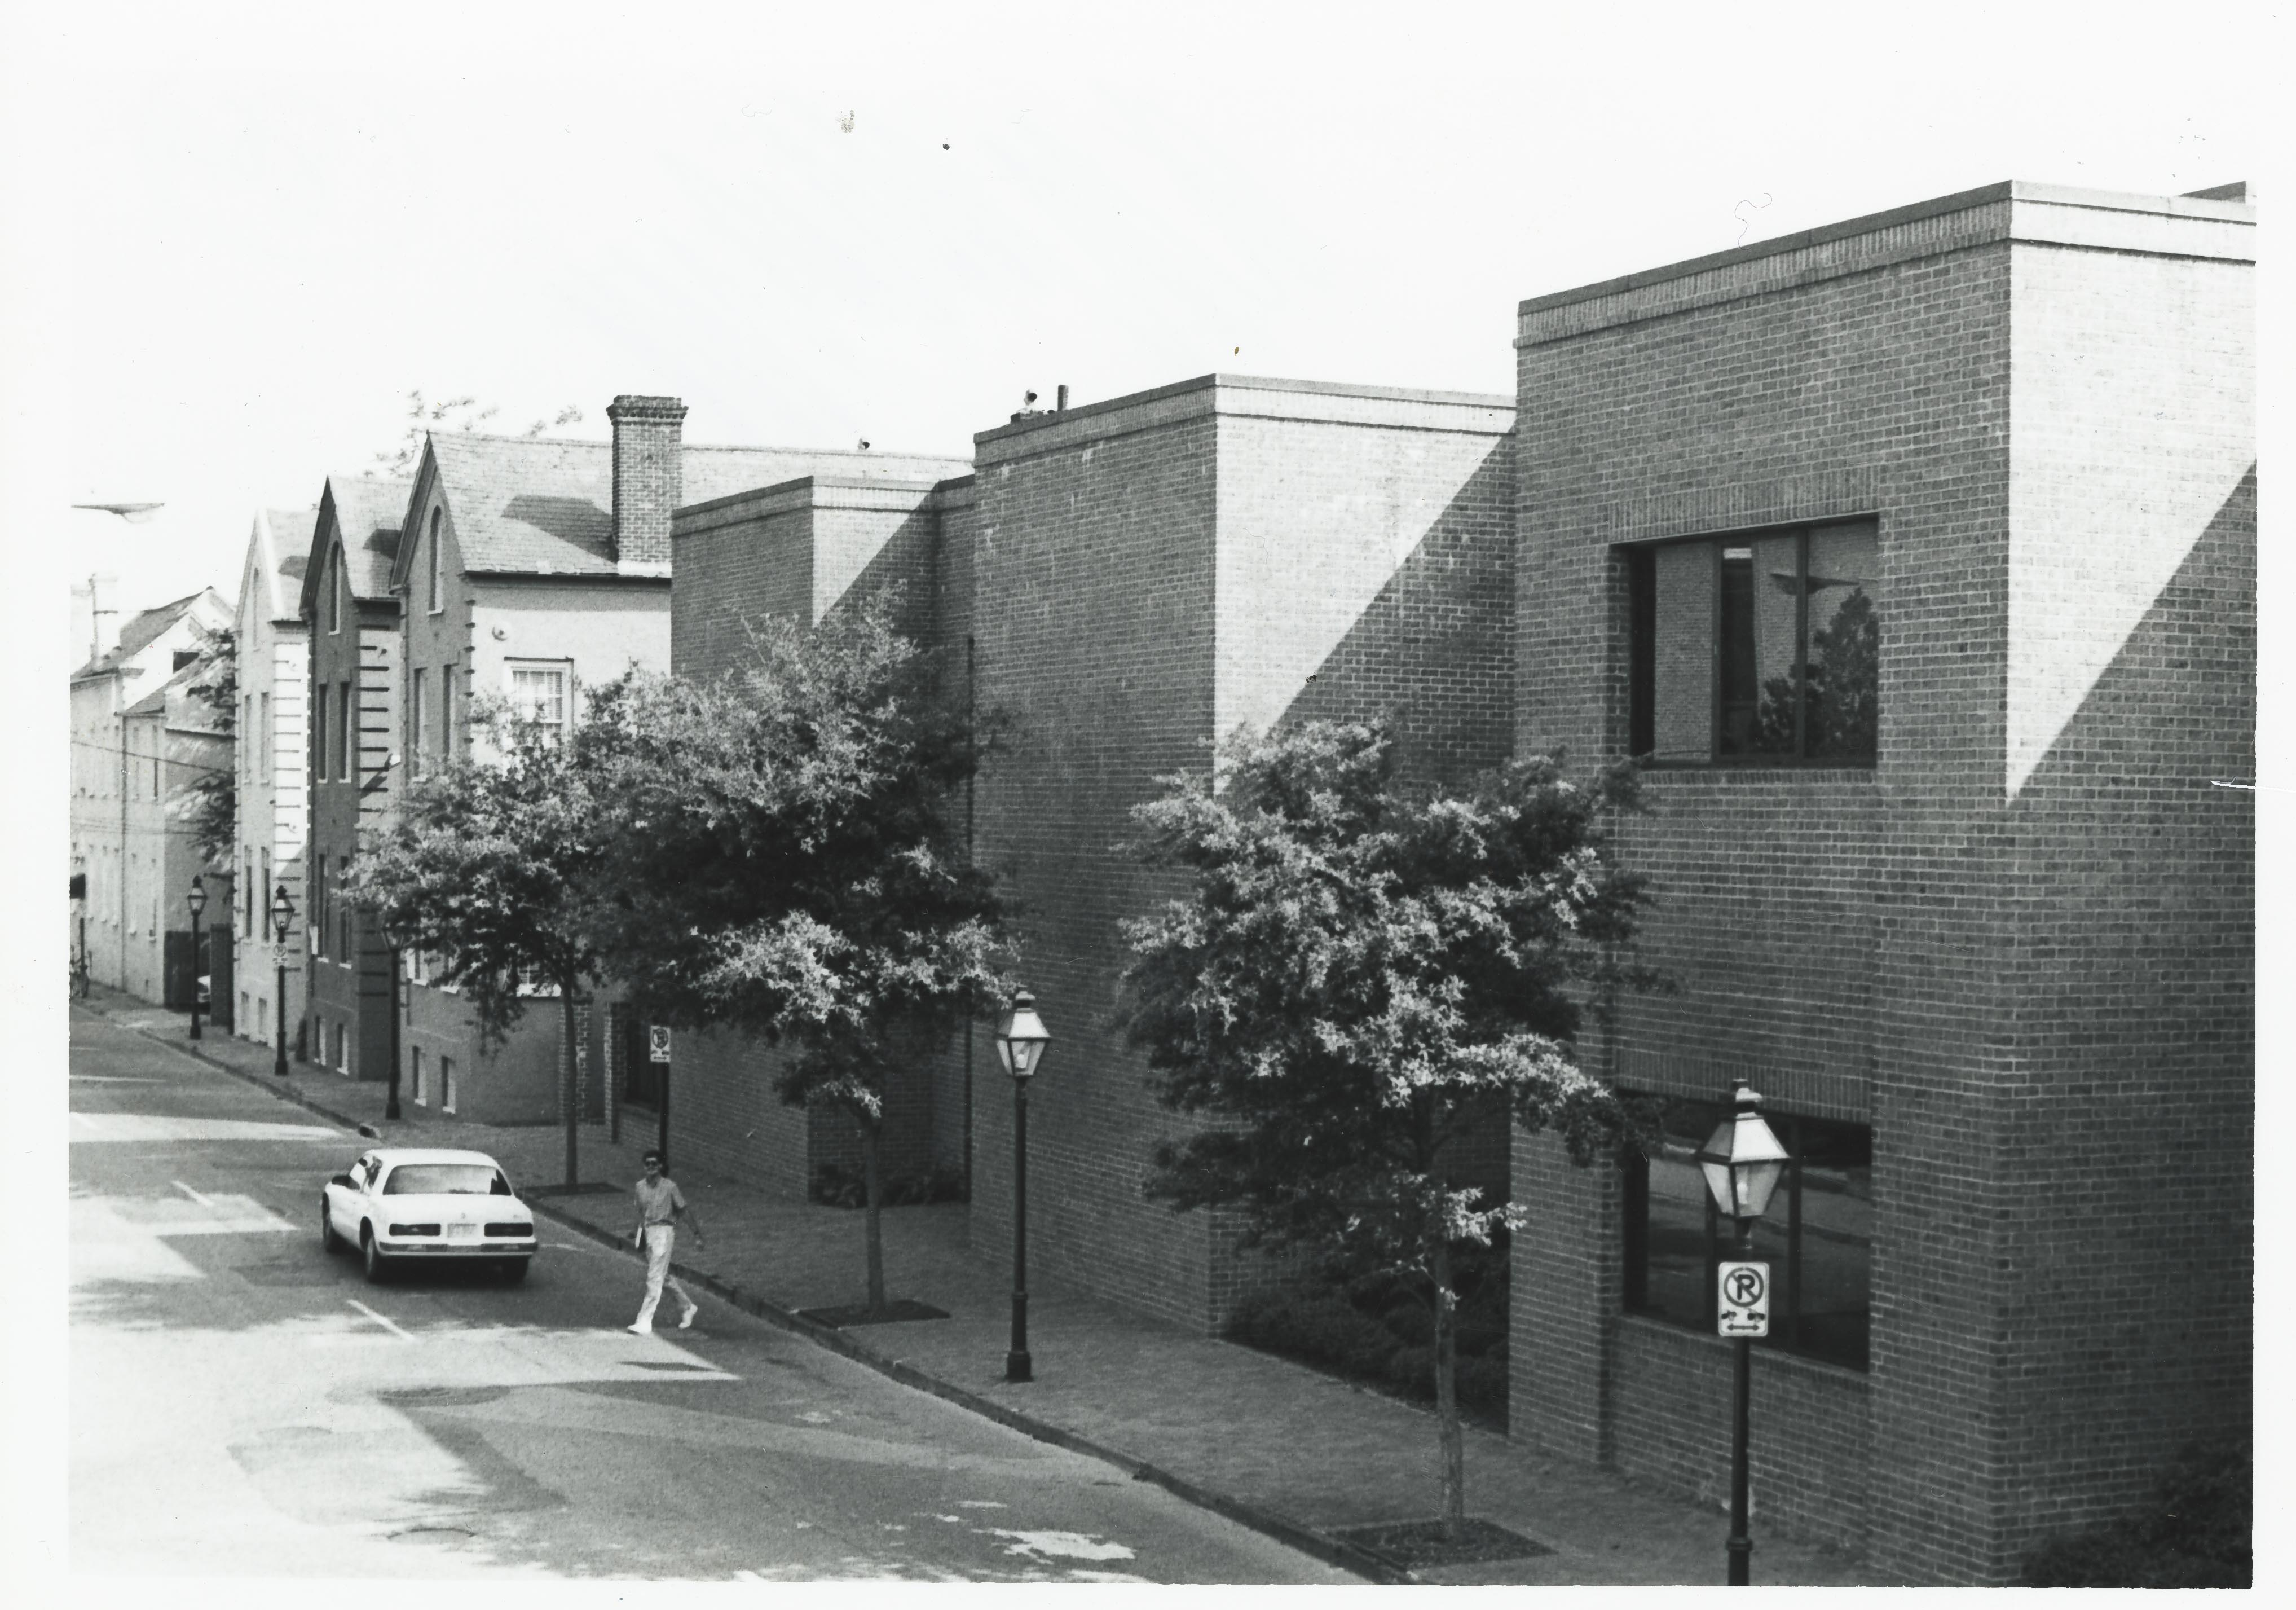 Thaddeus Street Education Center